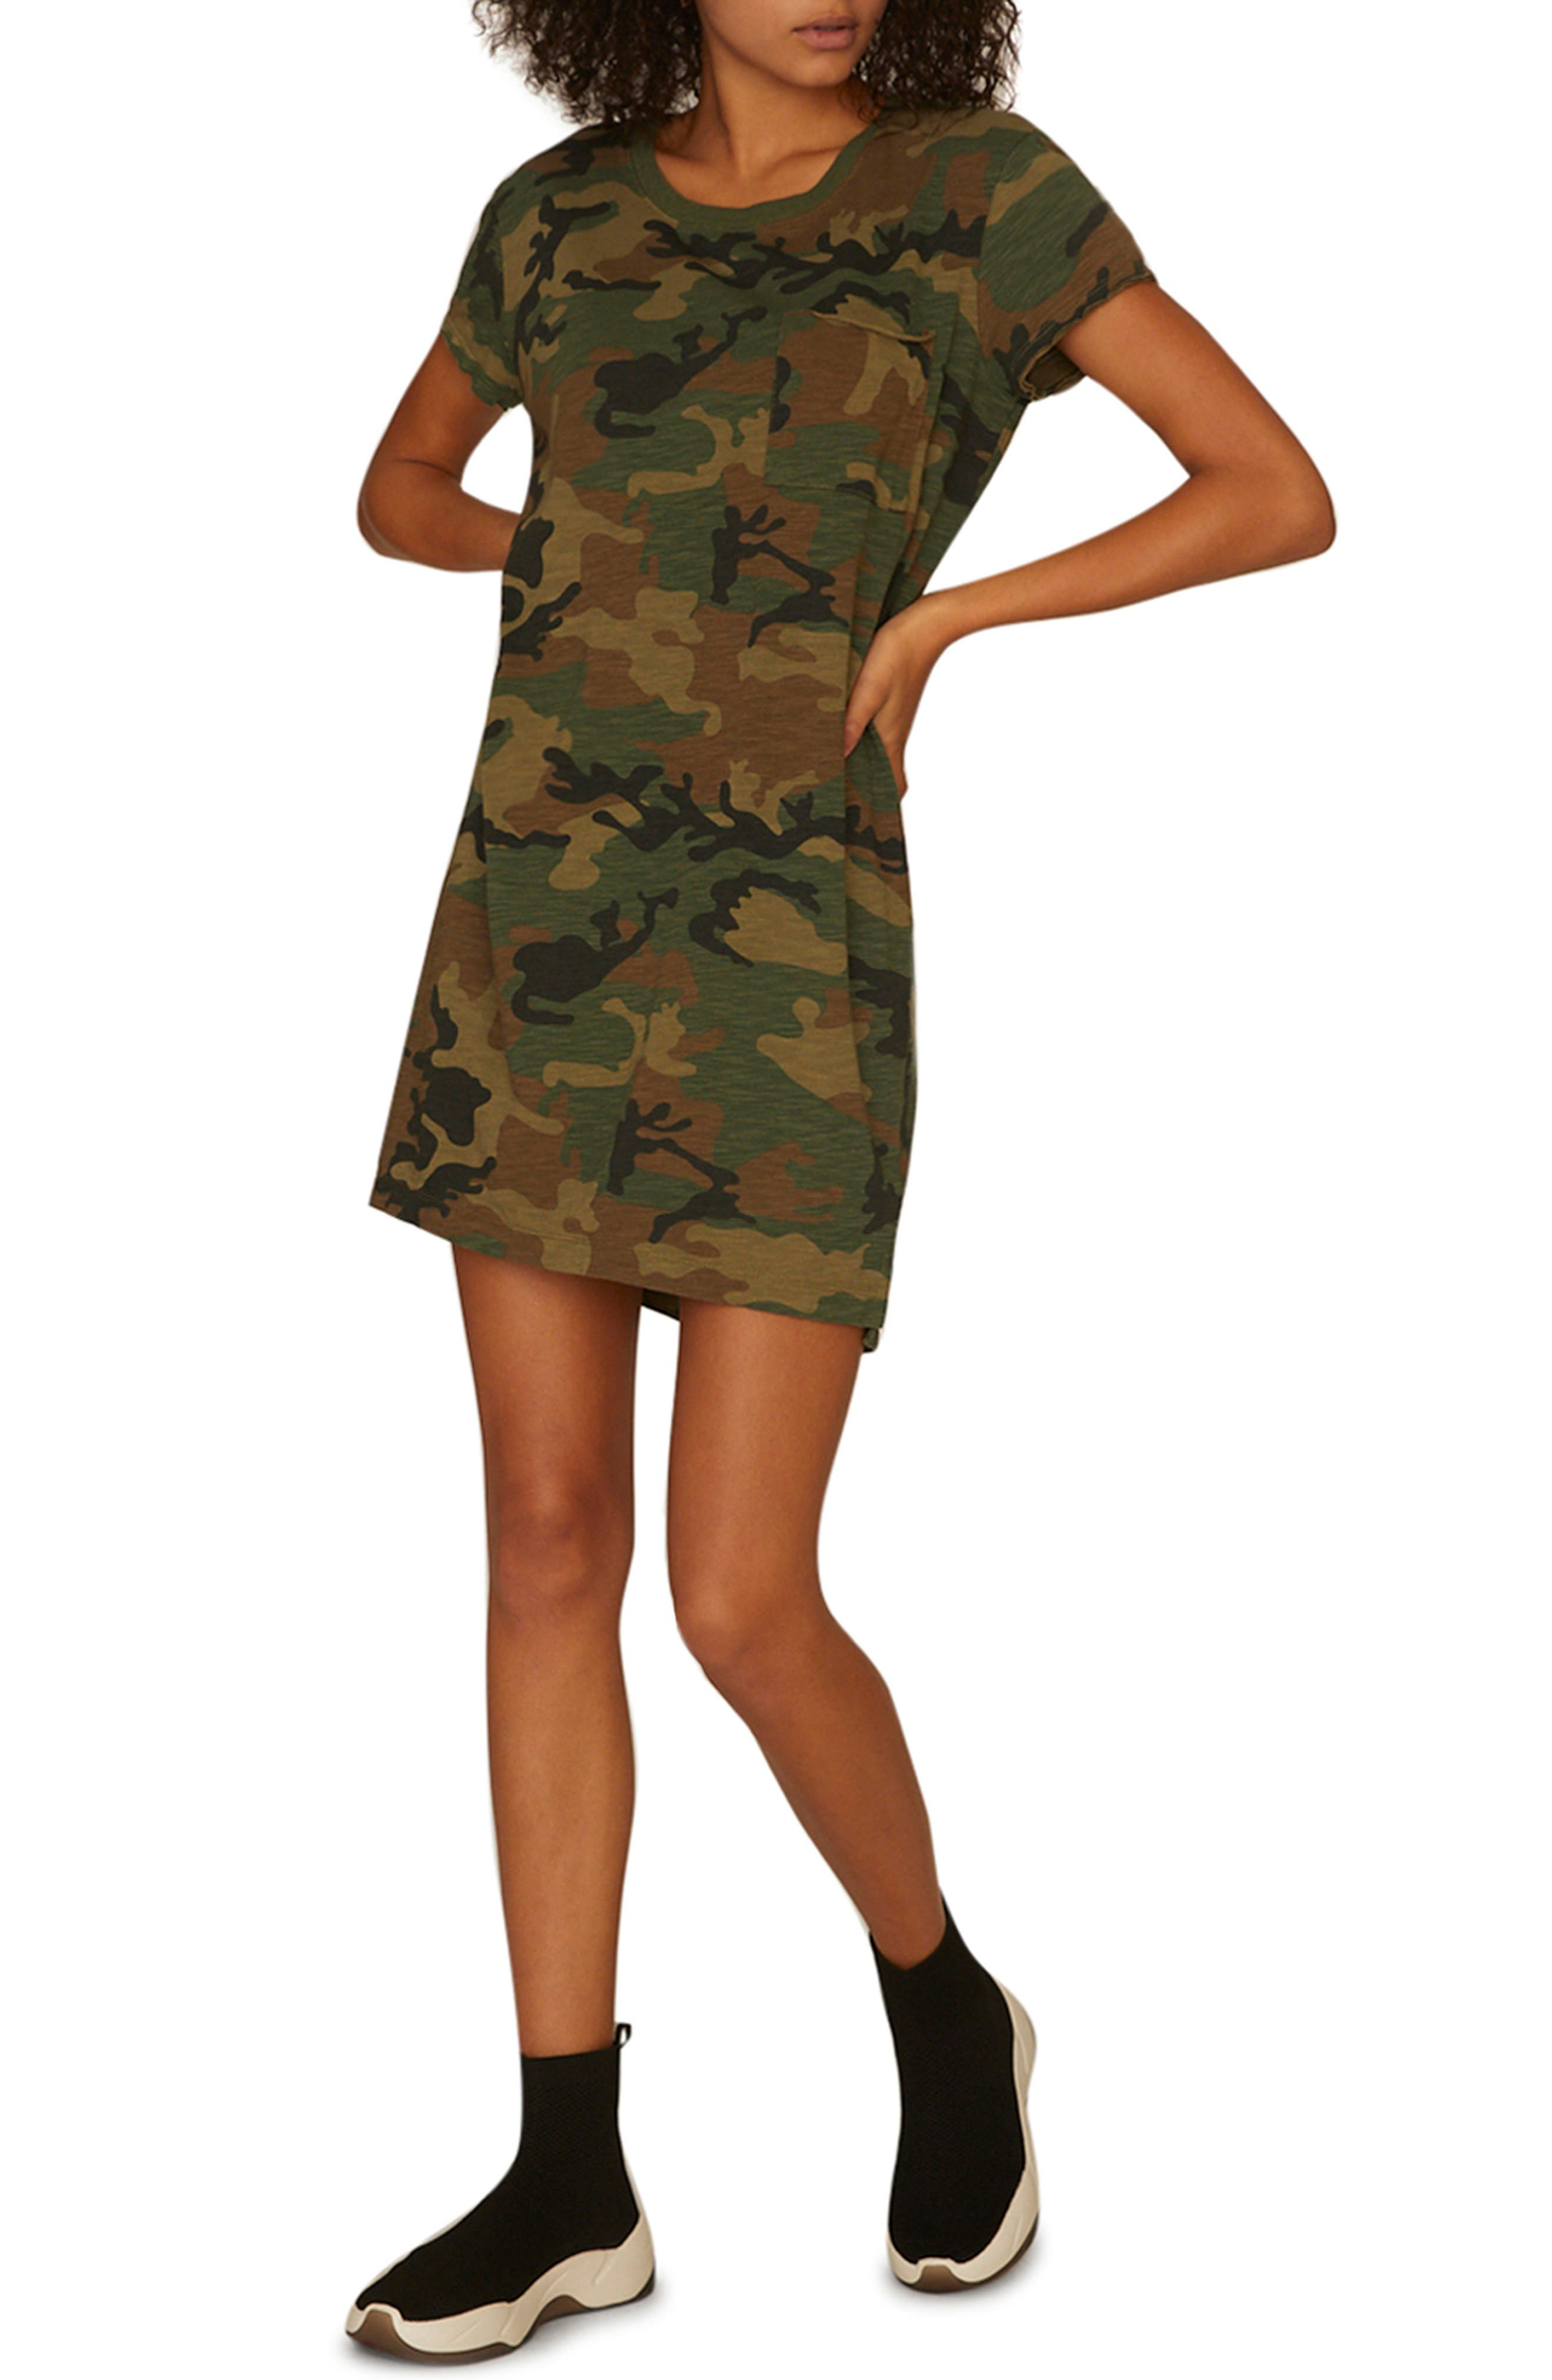 SANCTUARY Camo Print T-Shirt Dress, Main, color, LOVE CAMO